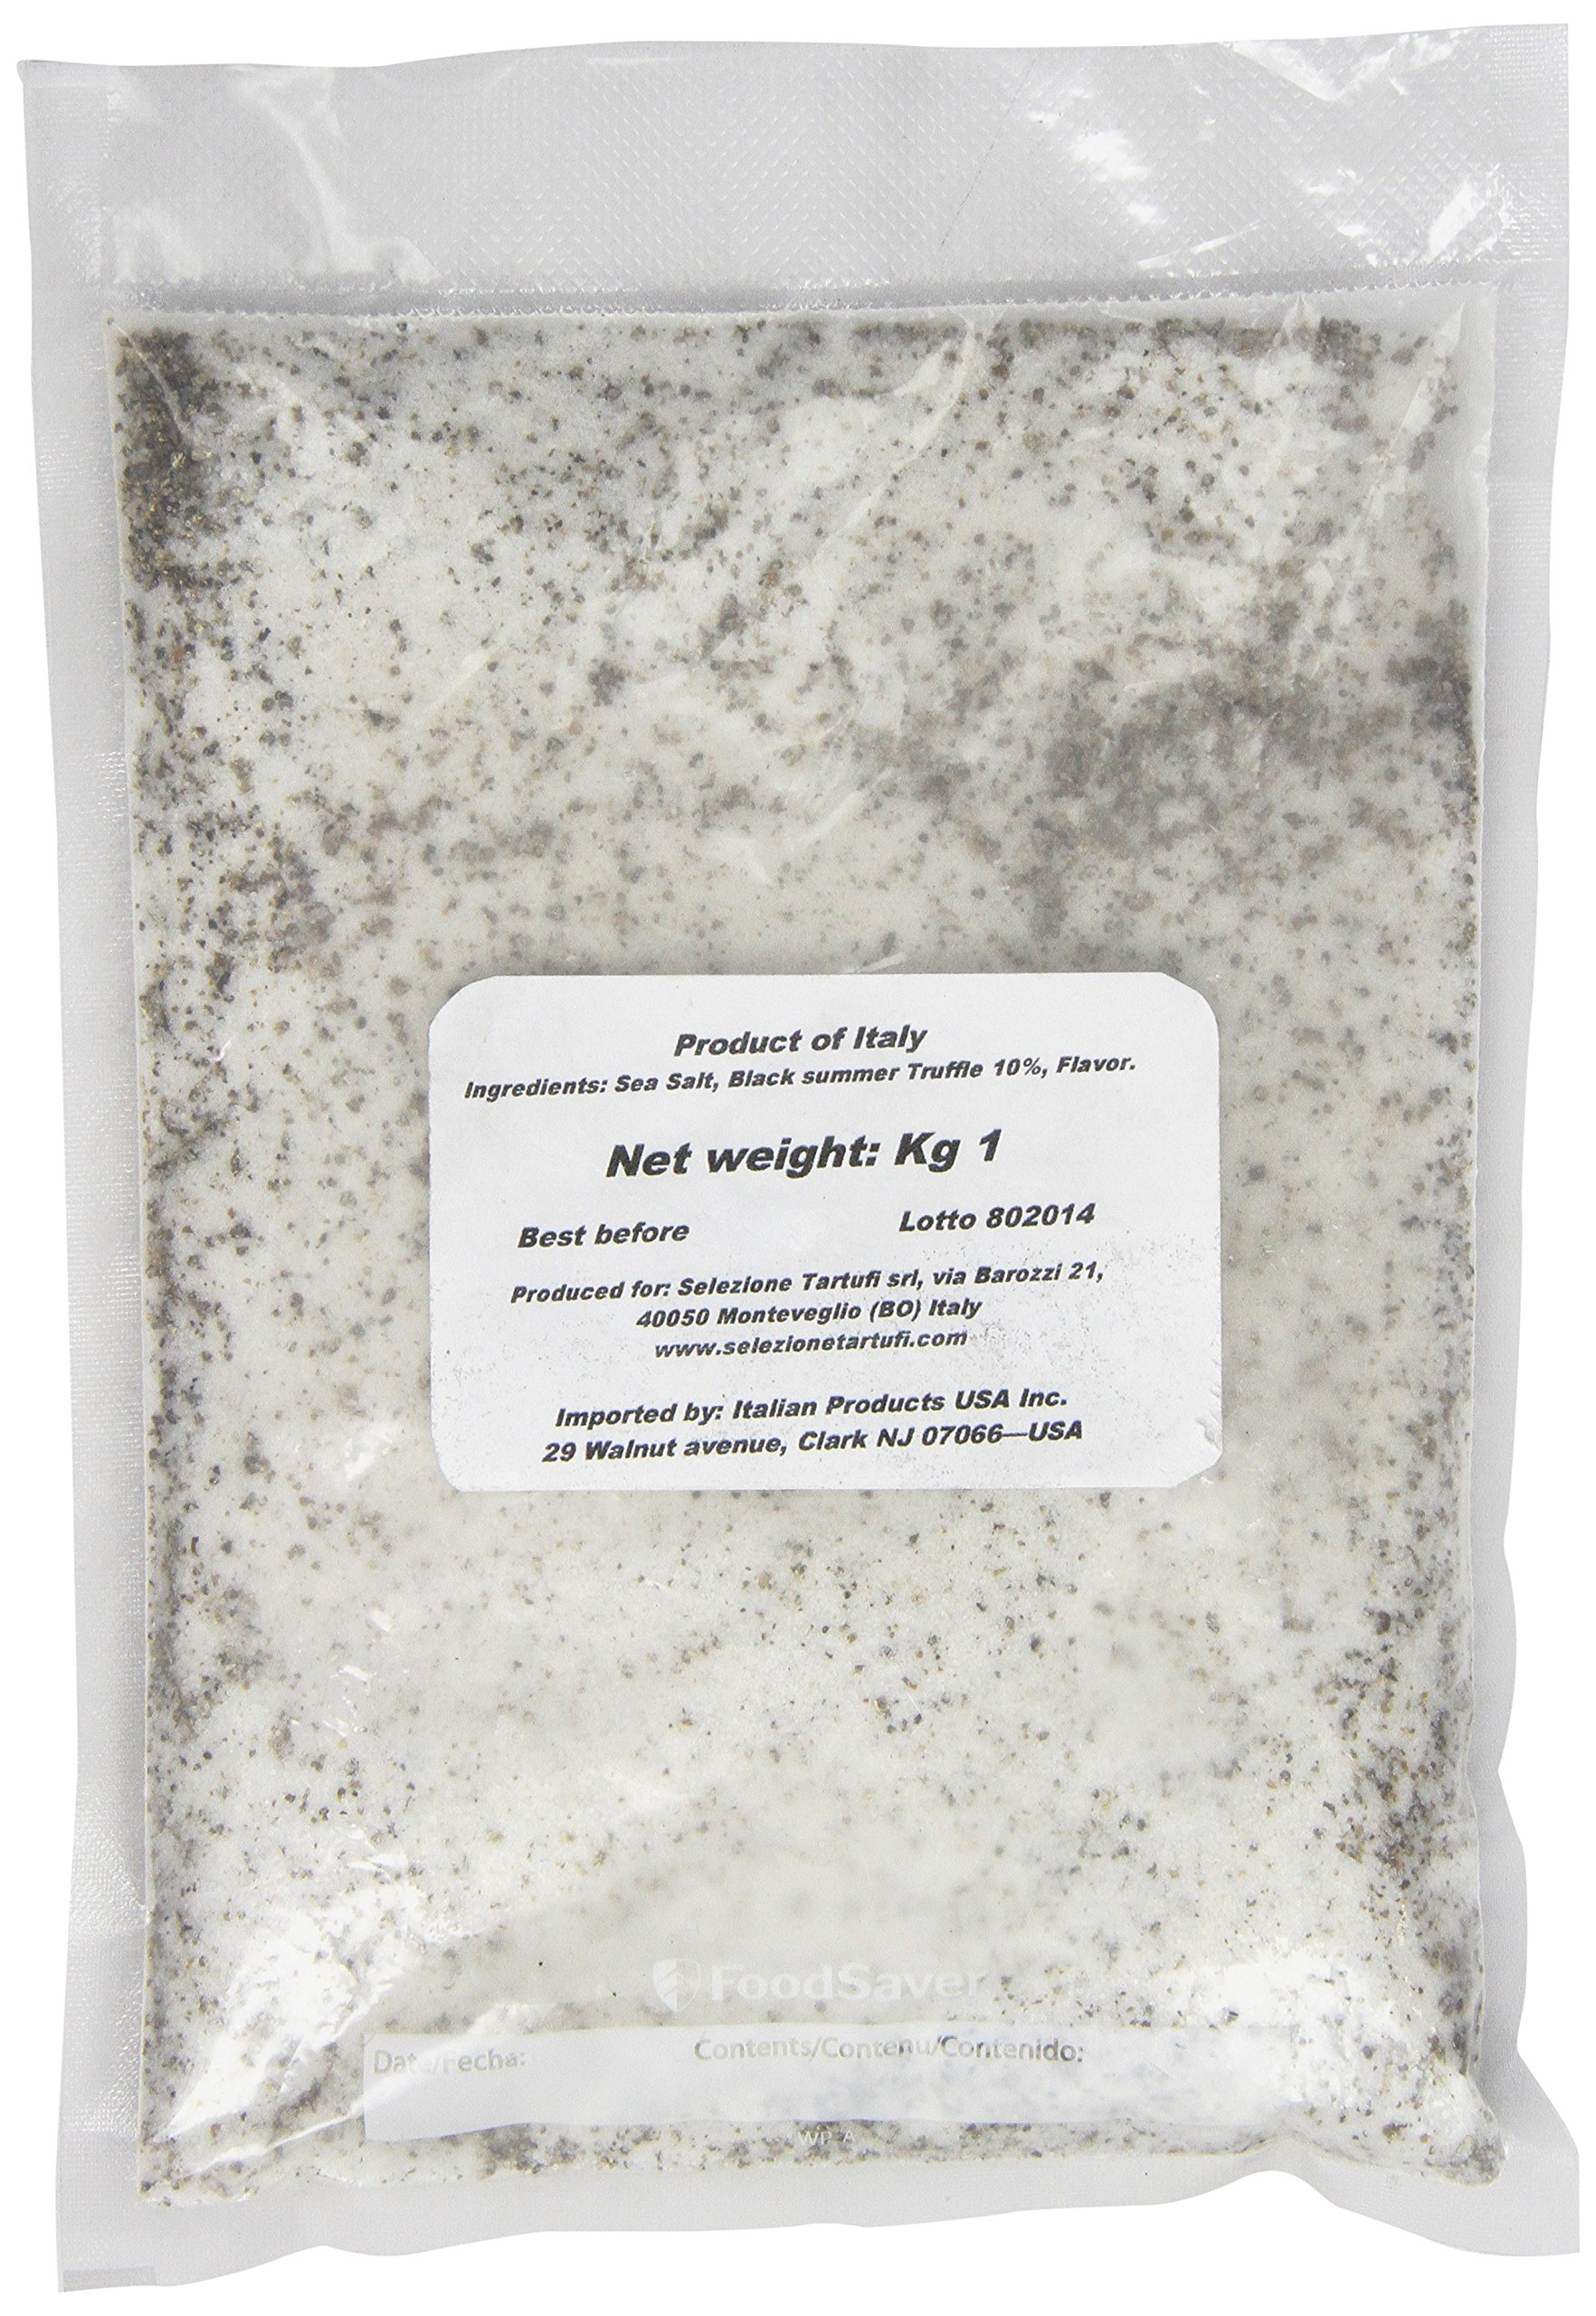 Selezione Tartufi Black Truffle Salt 10% - Gourmet Foodservice, 2.2-Pound Unit by Selezione Tartufi